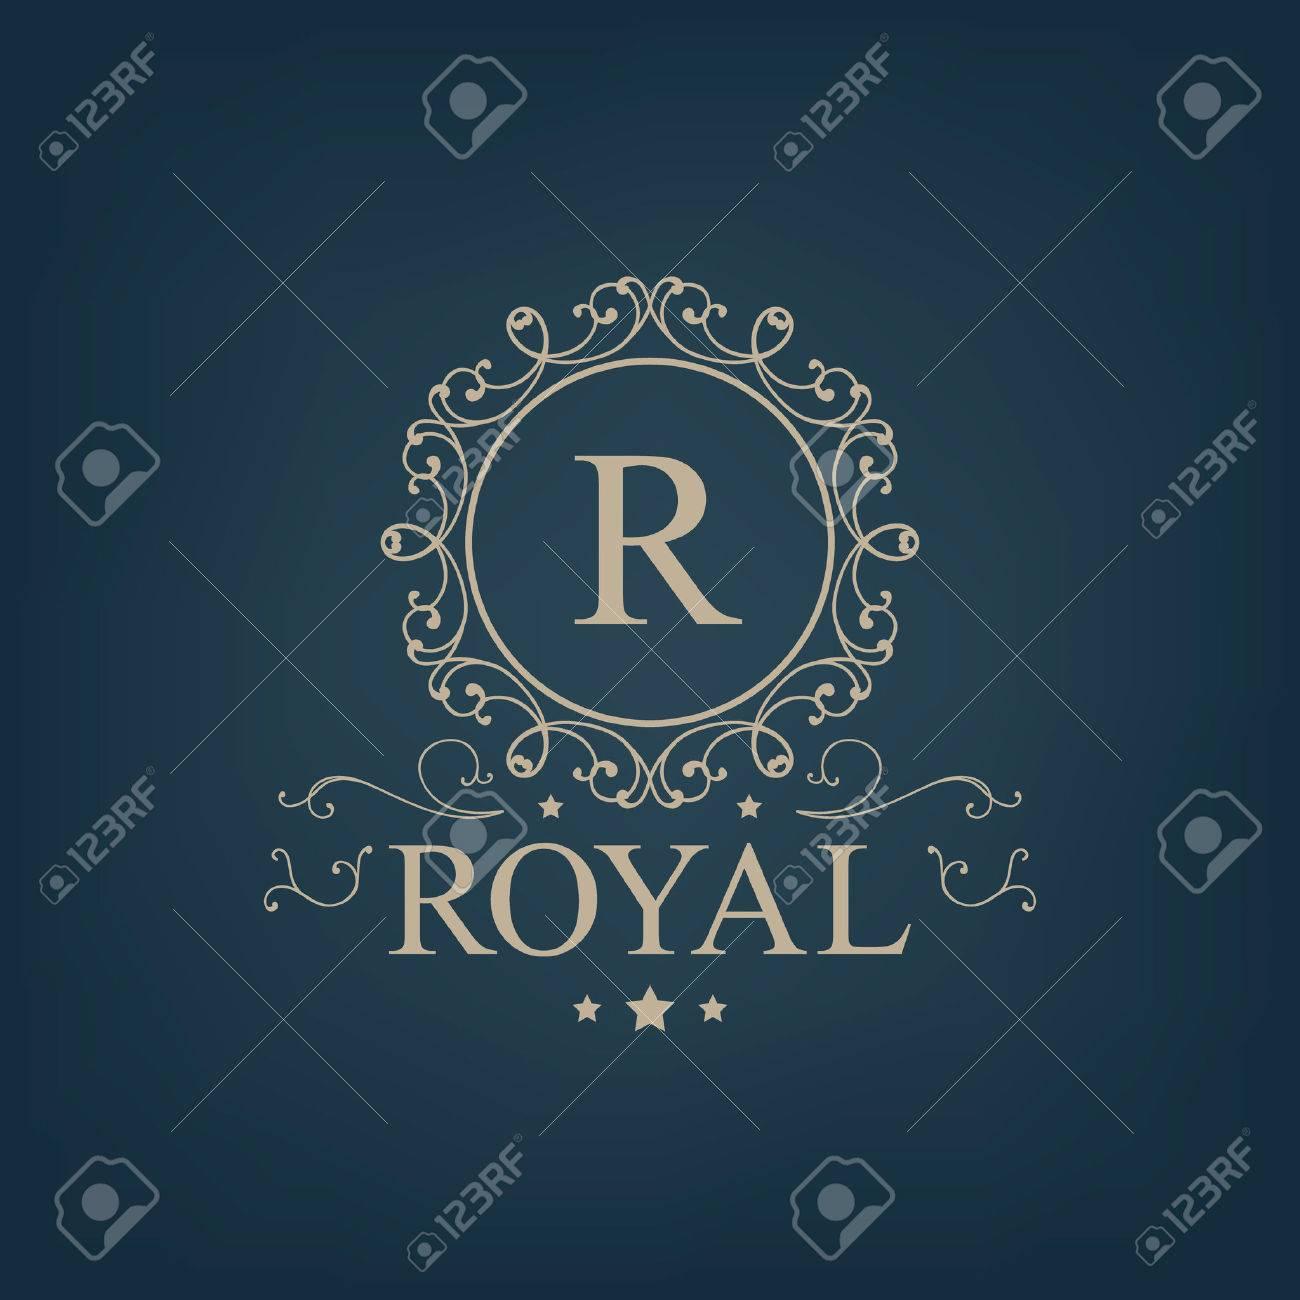 Vector luxury, royal monogram logo, icon isolated. Vintage, retro rich baroque sign, company branding - 47401414